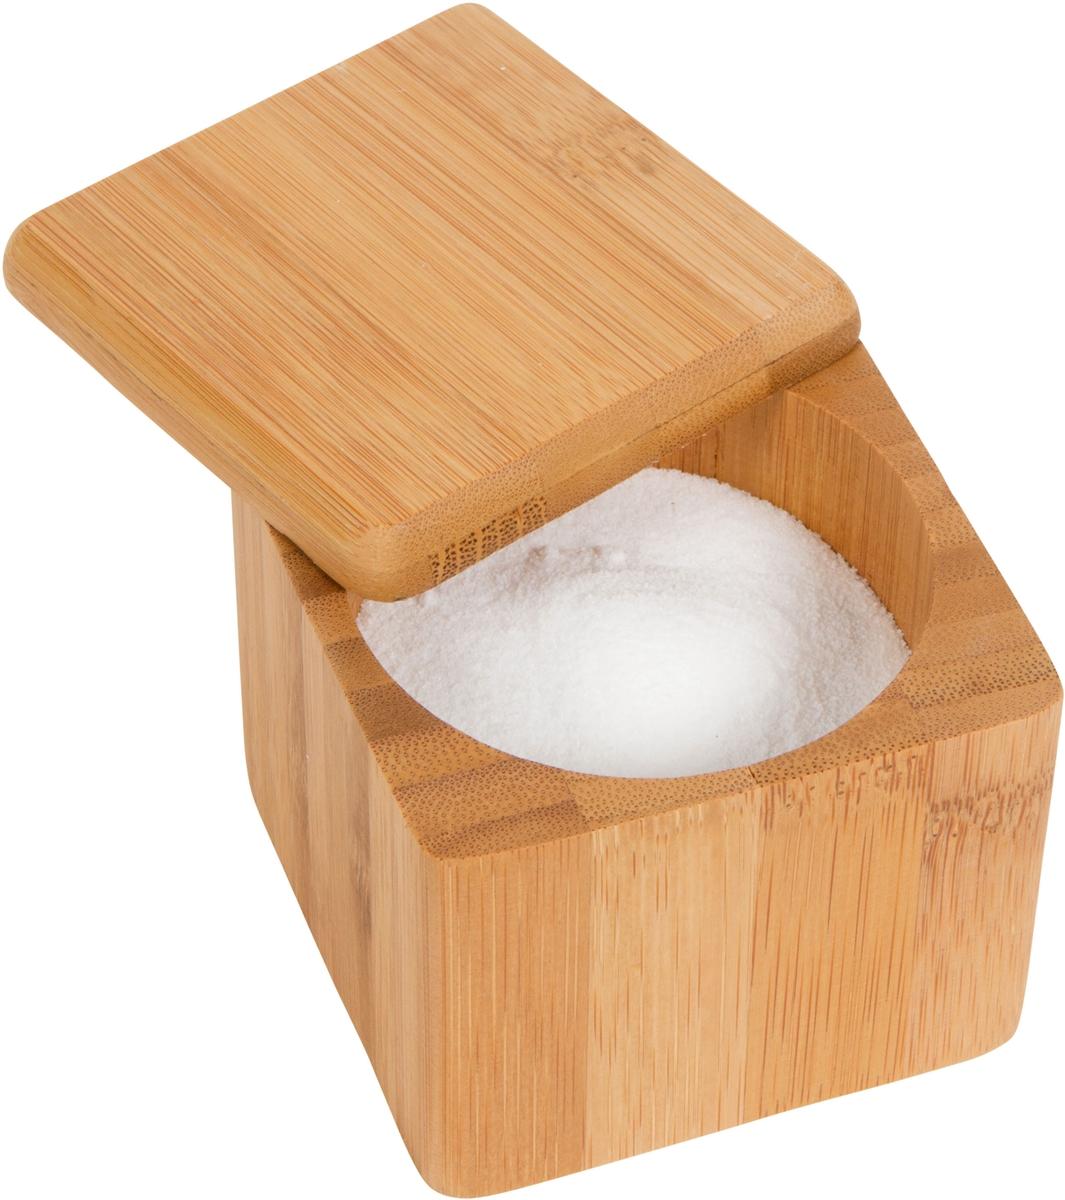 Bamboo Salt Box Kitchen Accessory Hold Your Salt